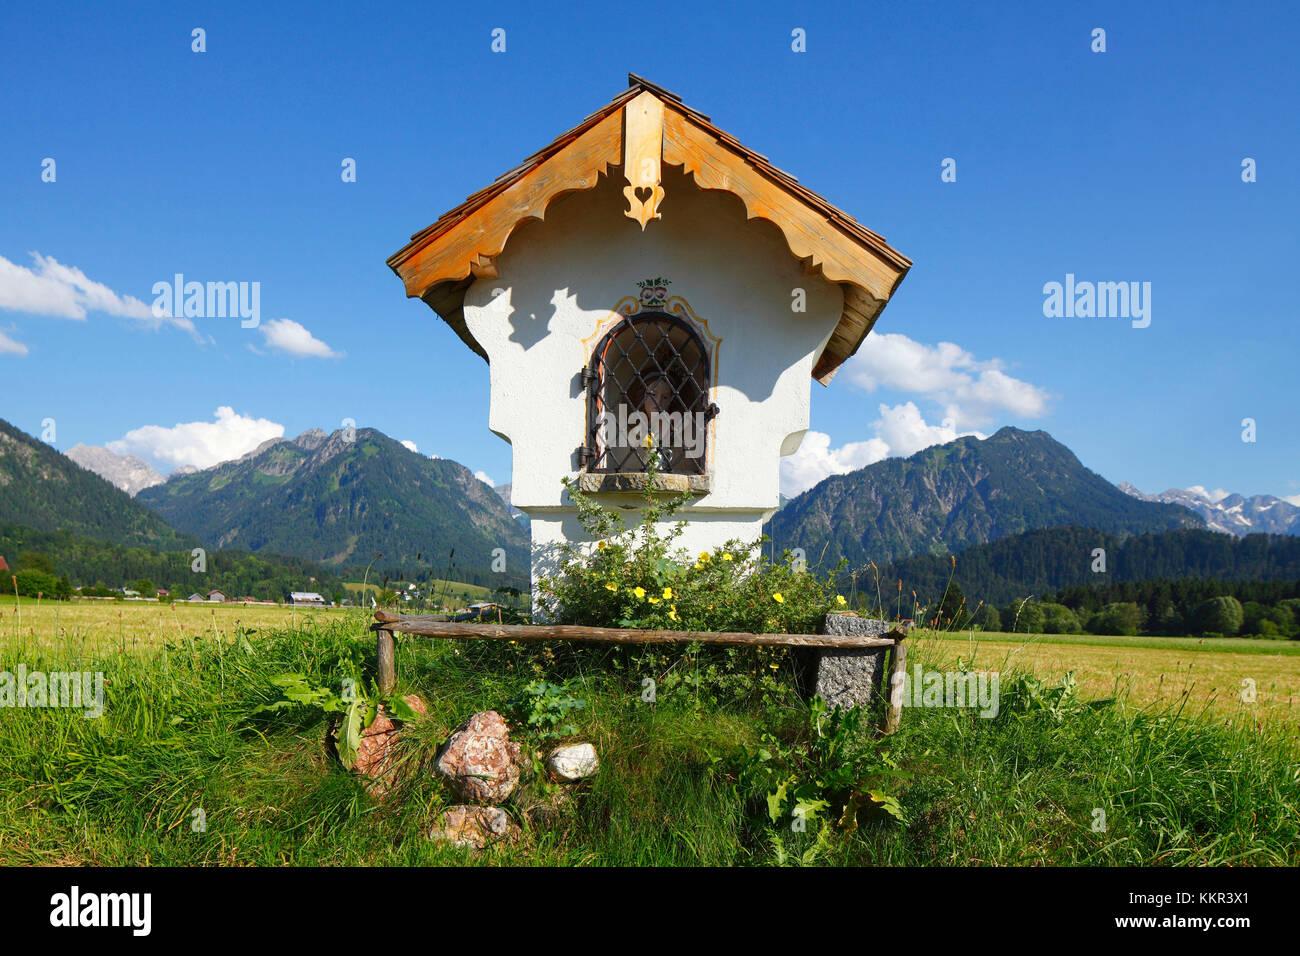 Bildstock, Oberstdorf, Oberallgäu, Allgäu, Schwaben, Bayern, Deutschland, Europa, Stockbild